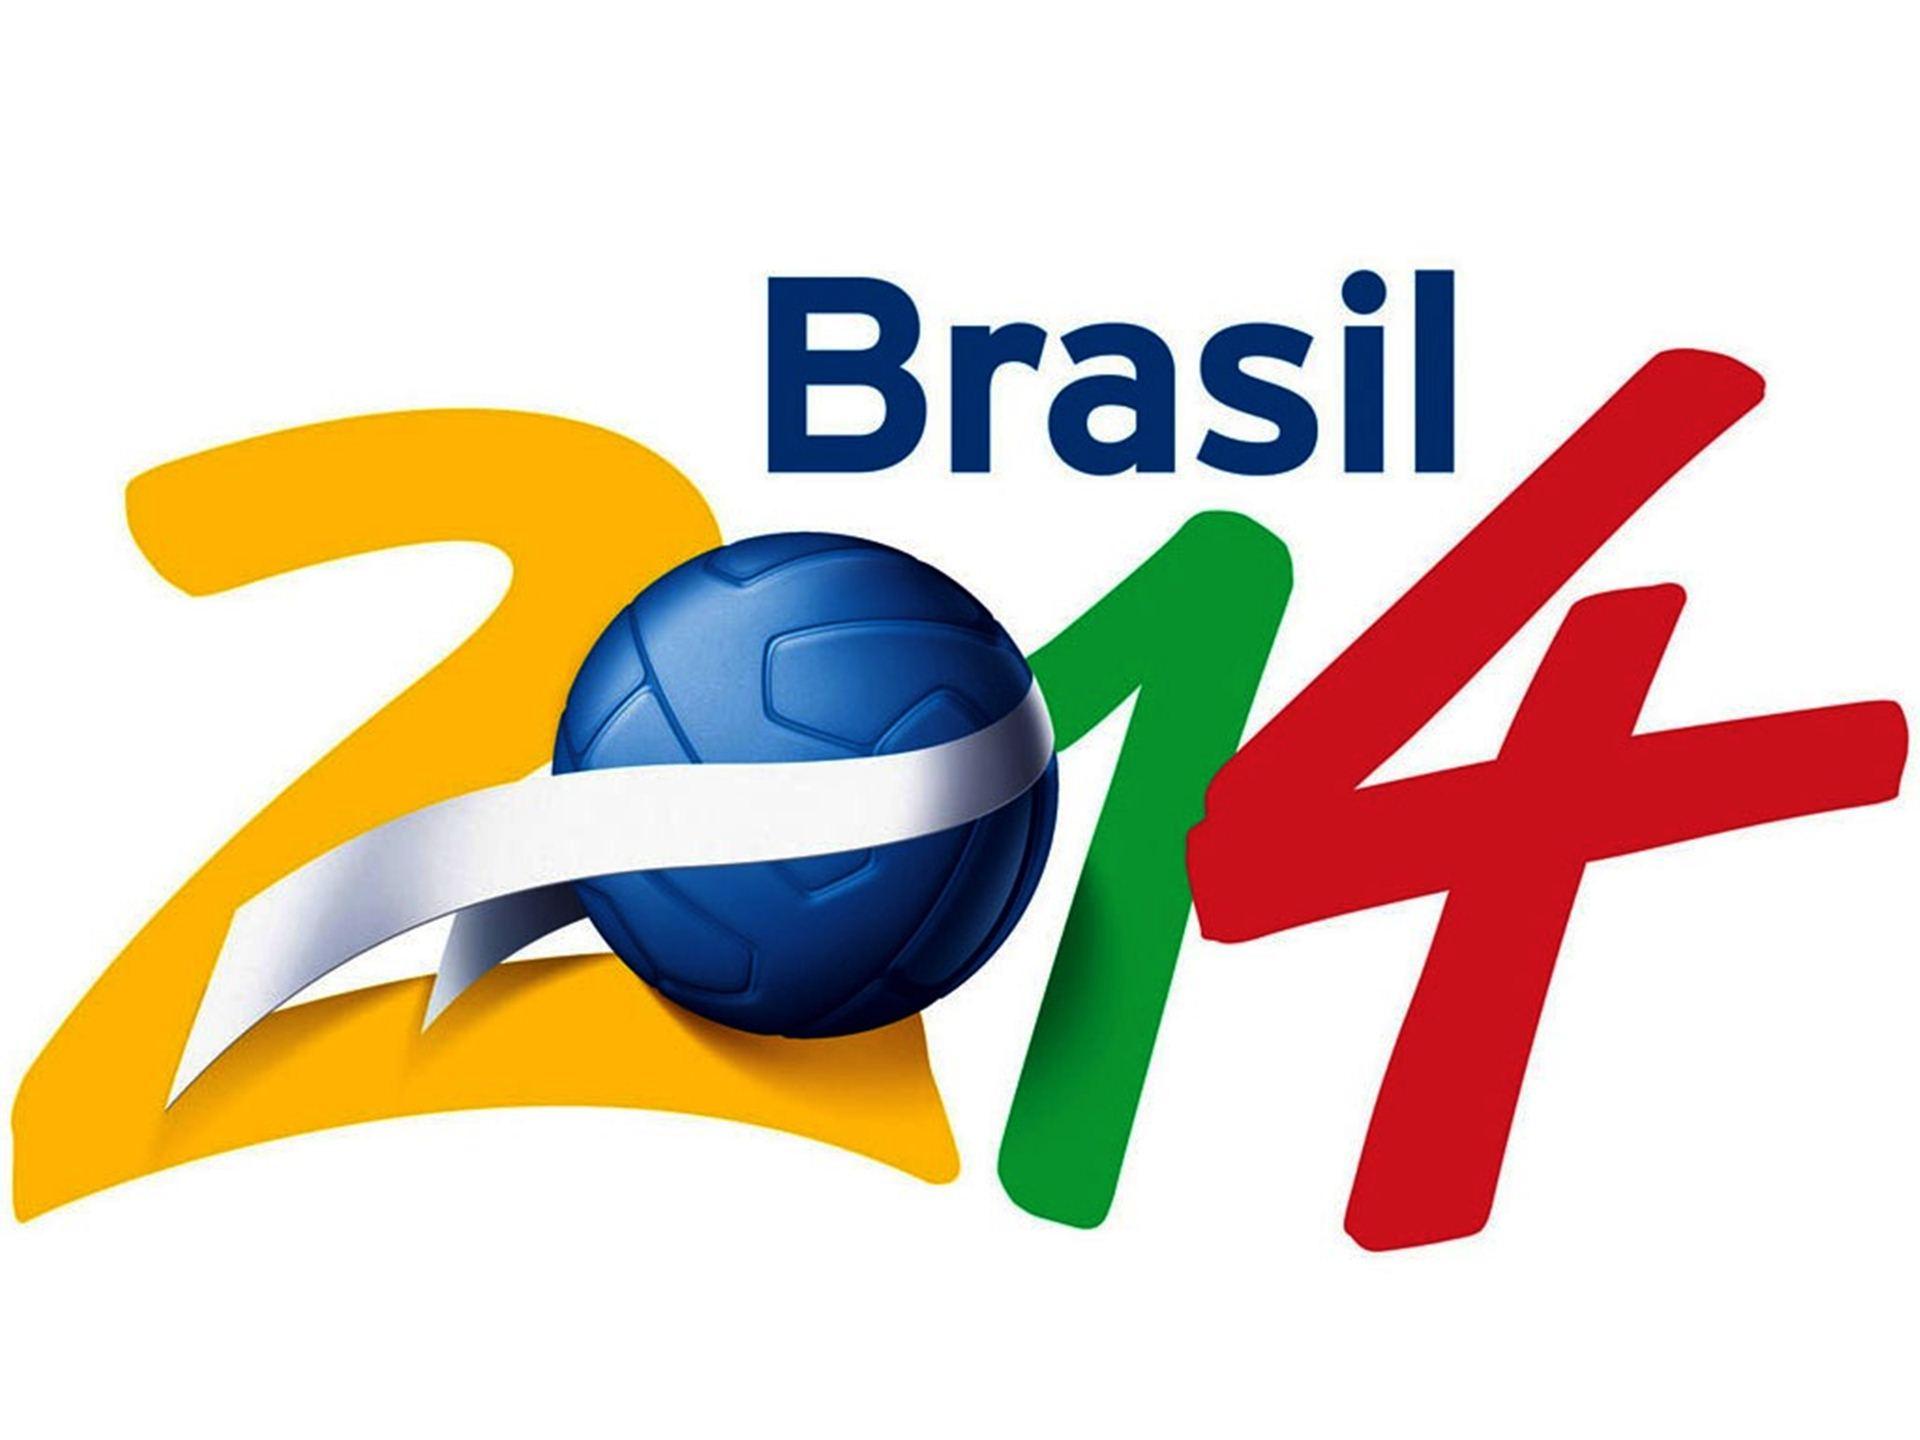 World Cup Brazil 2014